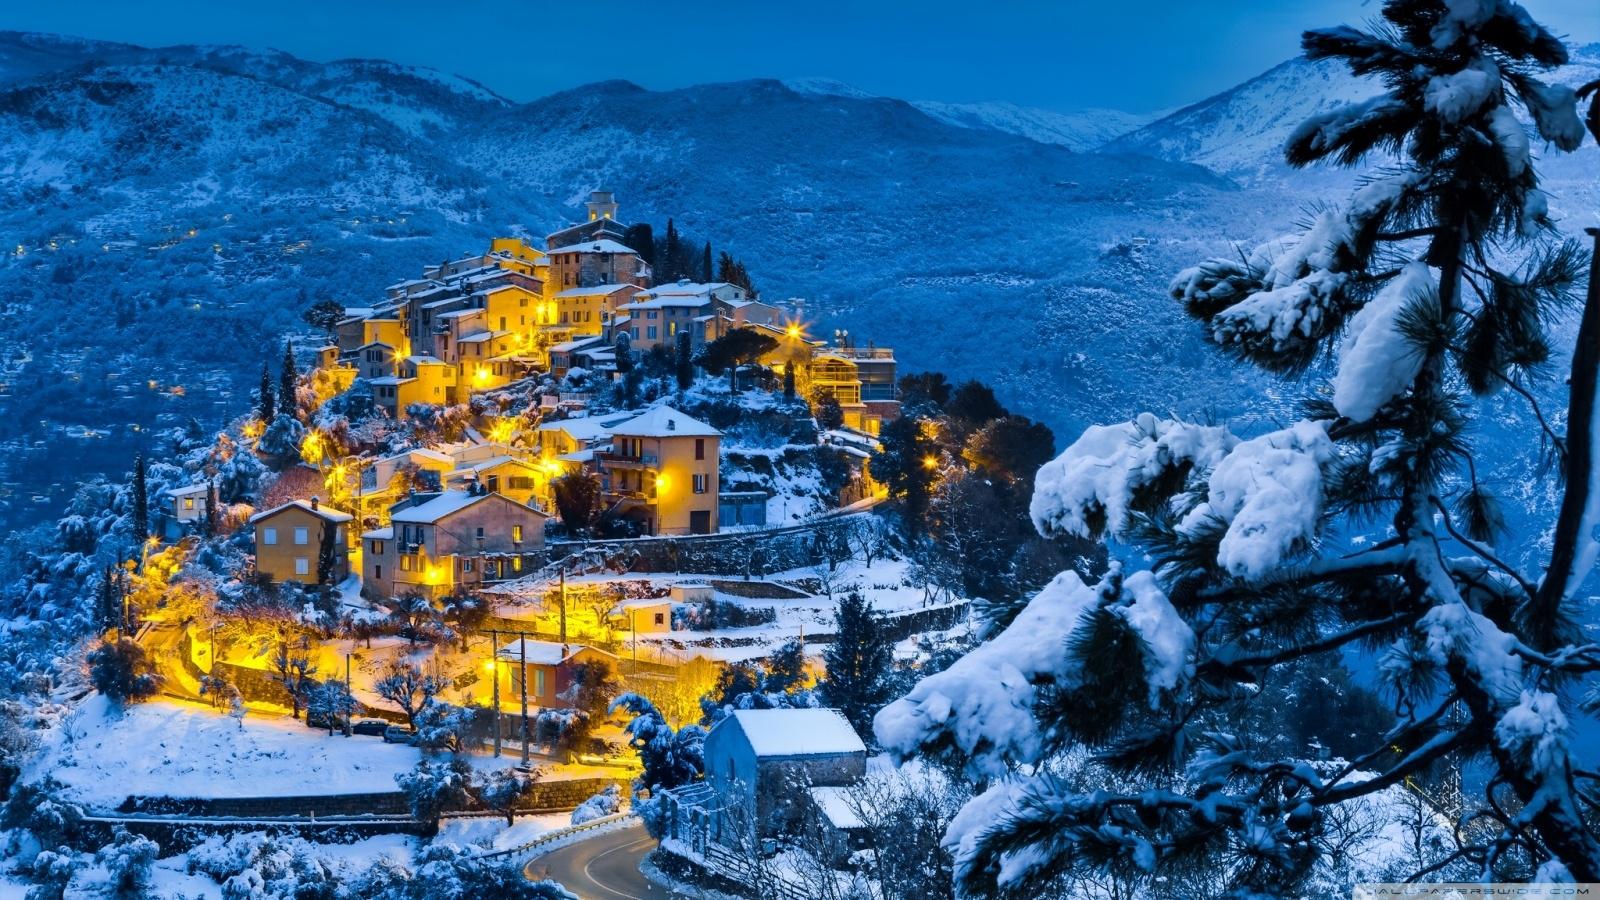 beautiful christmas village ❤ 4k hd desktop wallpaper for 4k ultra